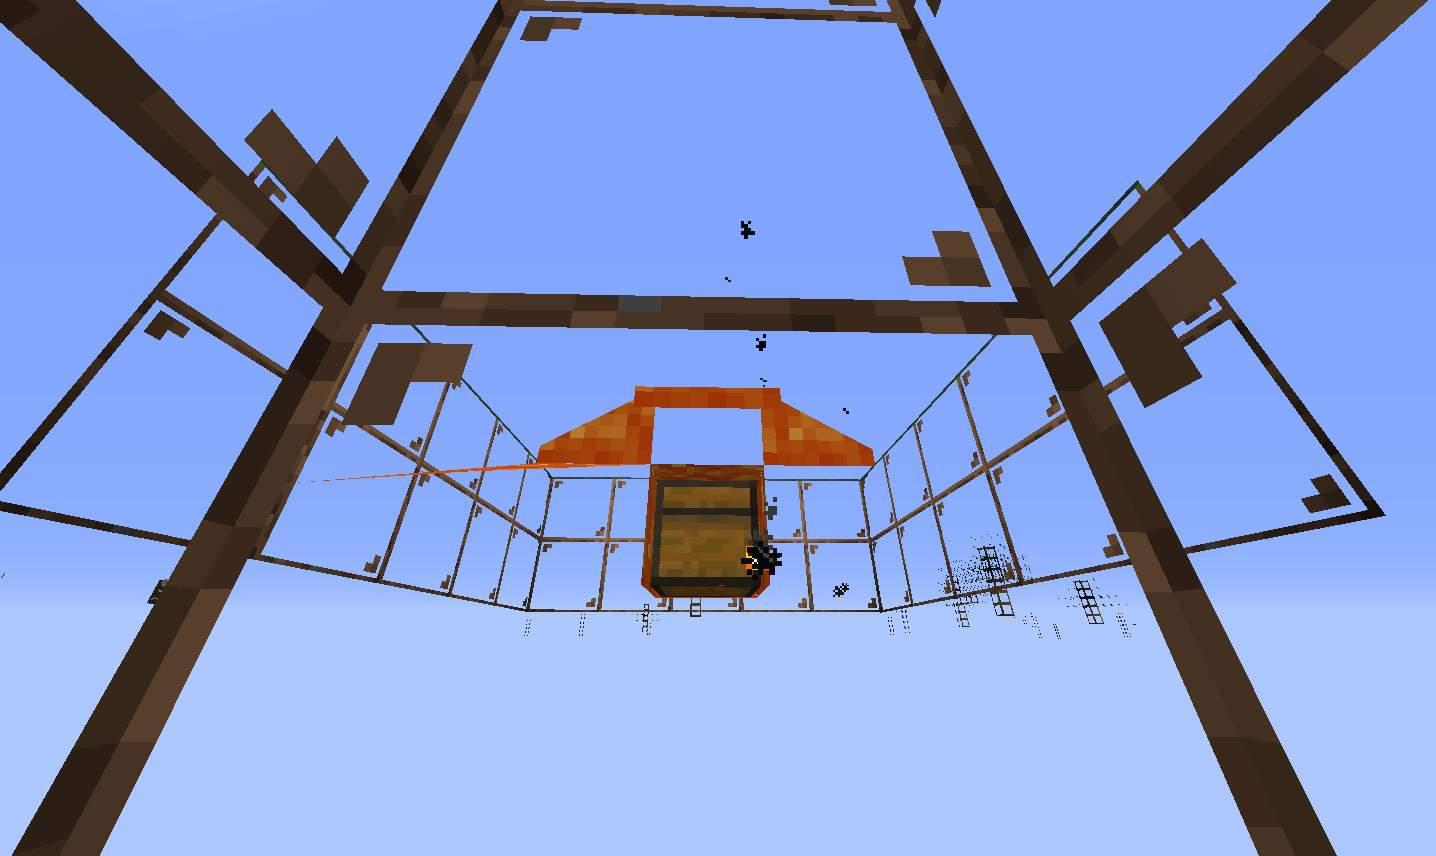 ban-xray-texture-minecraft-003